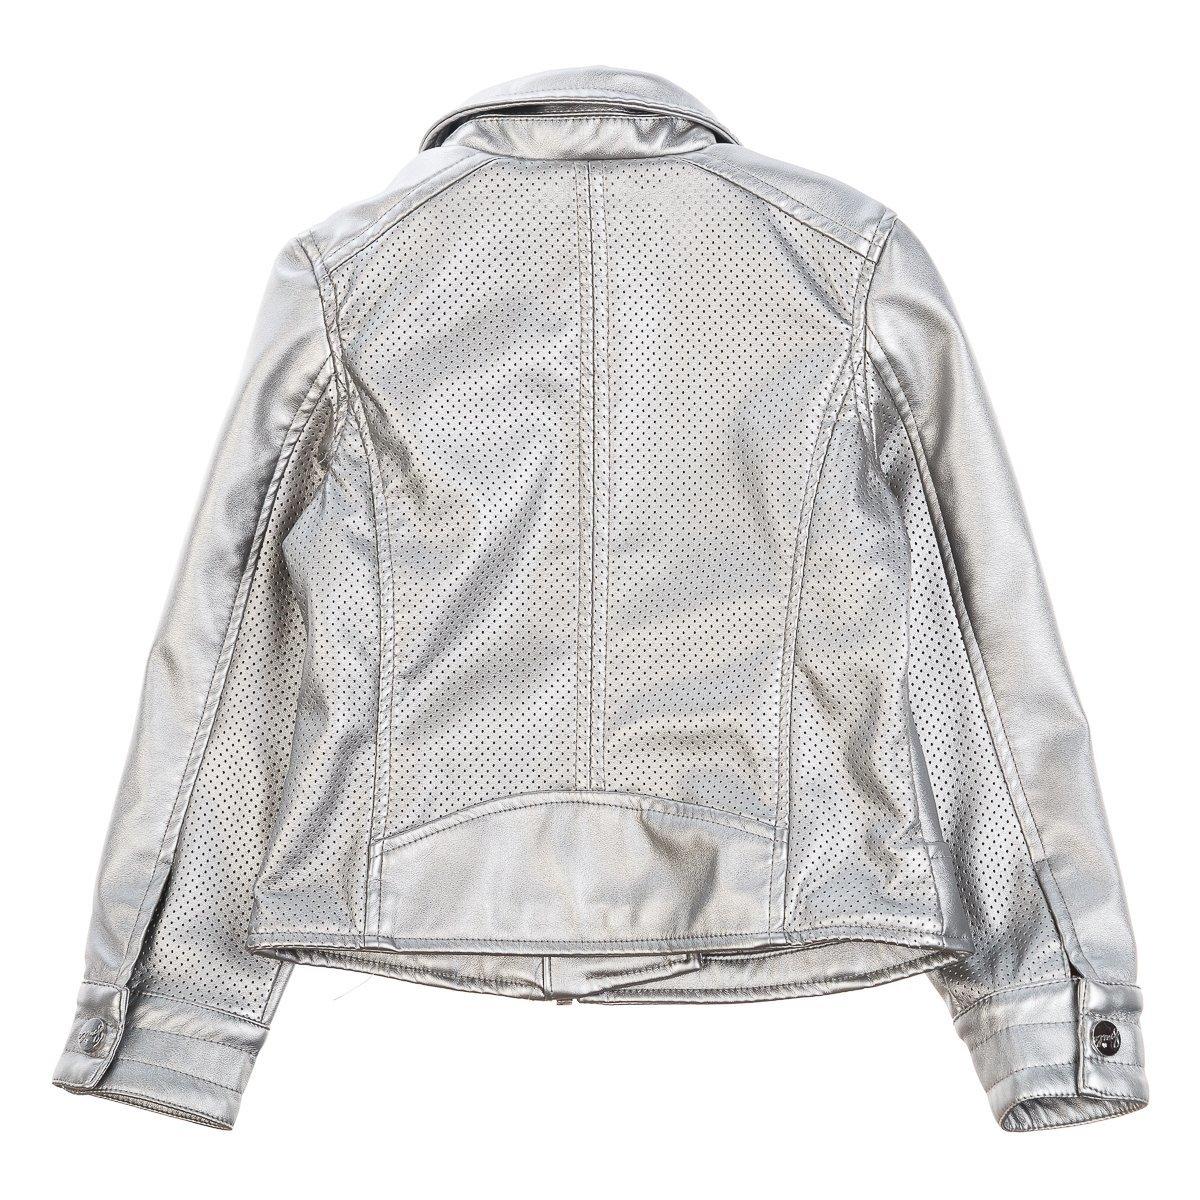 Верхняя одежда, Куртка BluKids Silver Bell, р. 110 5293518 ТМ: BluKids, серебро  - купить со скидкой